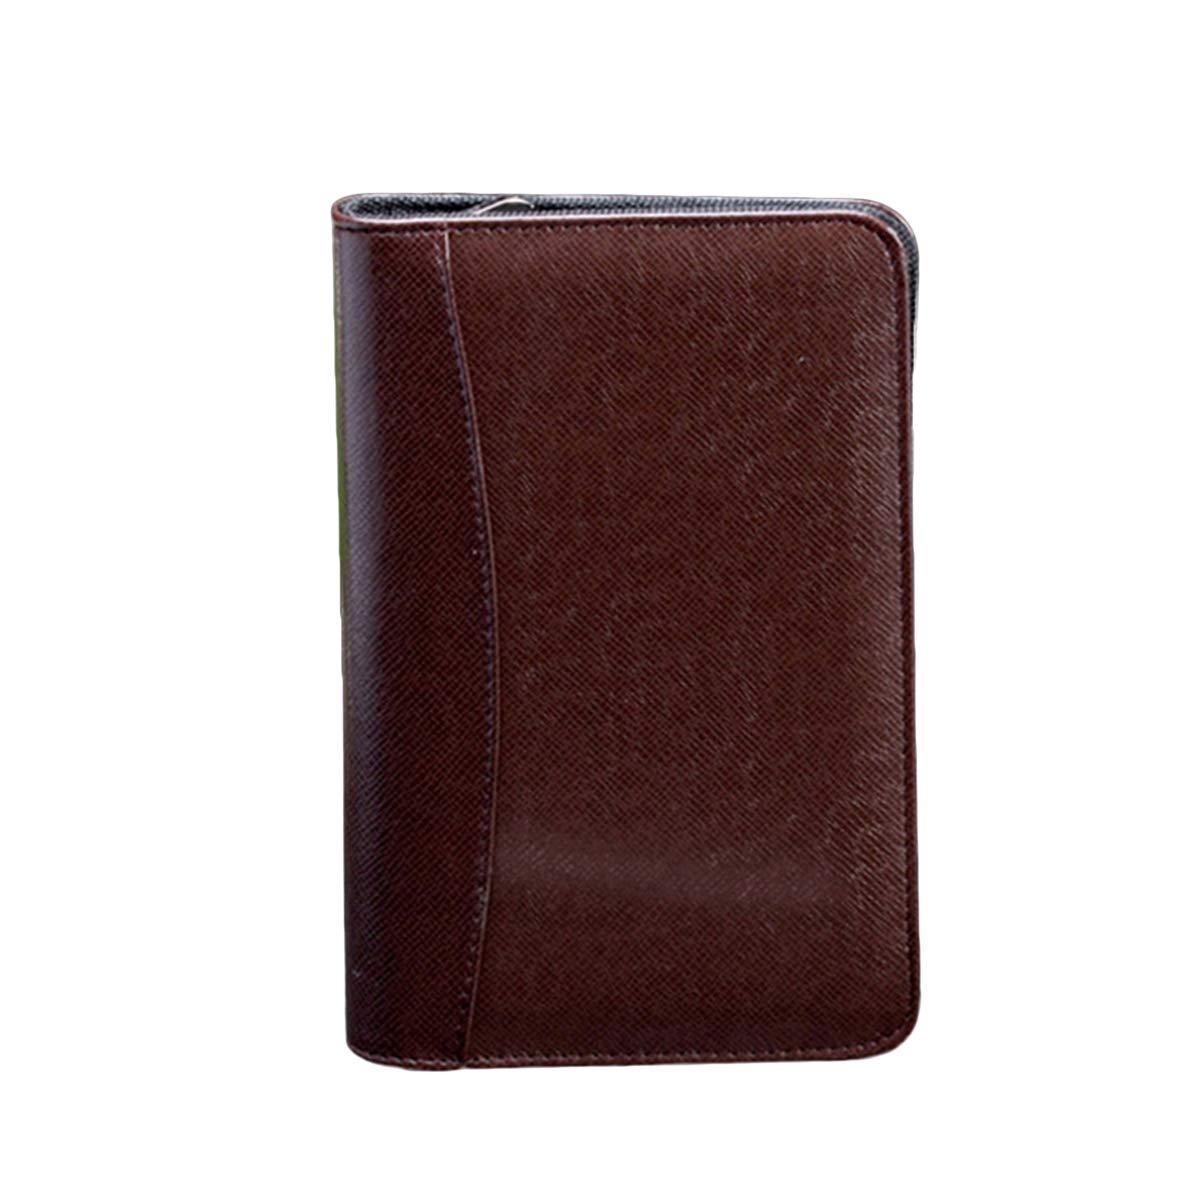 STOBOK 2Pcs Zippered Portfolio Binder Pu Leather Cover A5 Notebook Interview Resume Document Organizer with Calculator